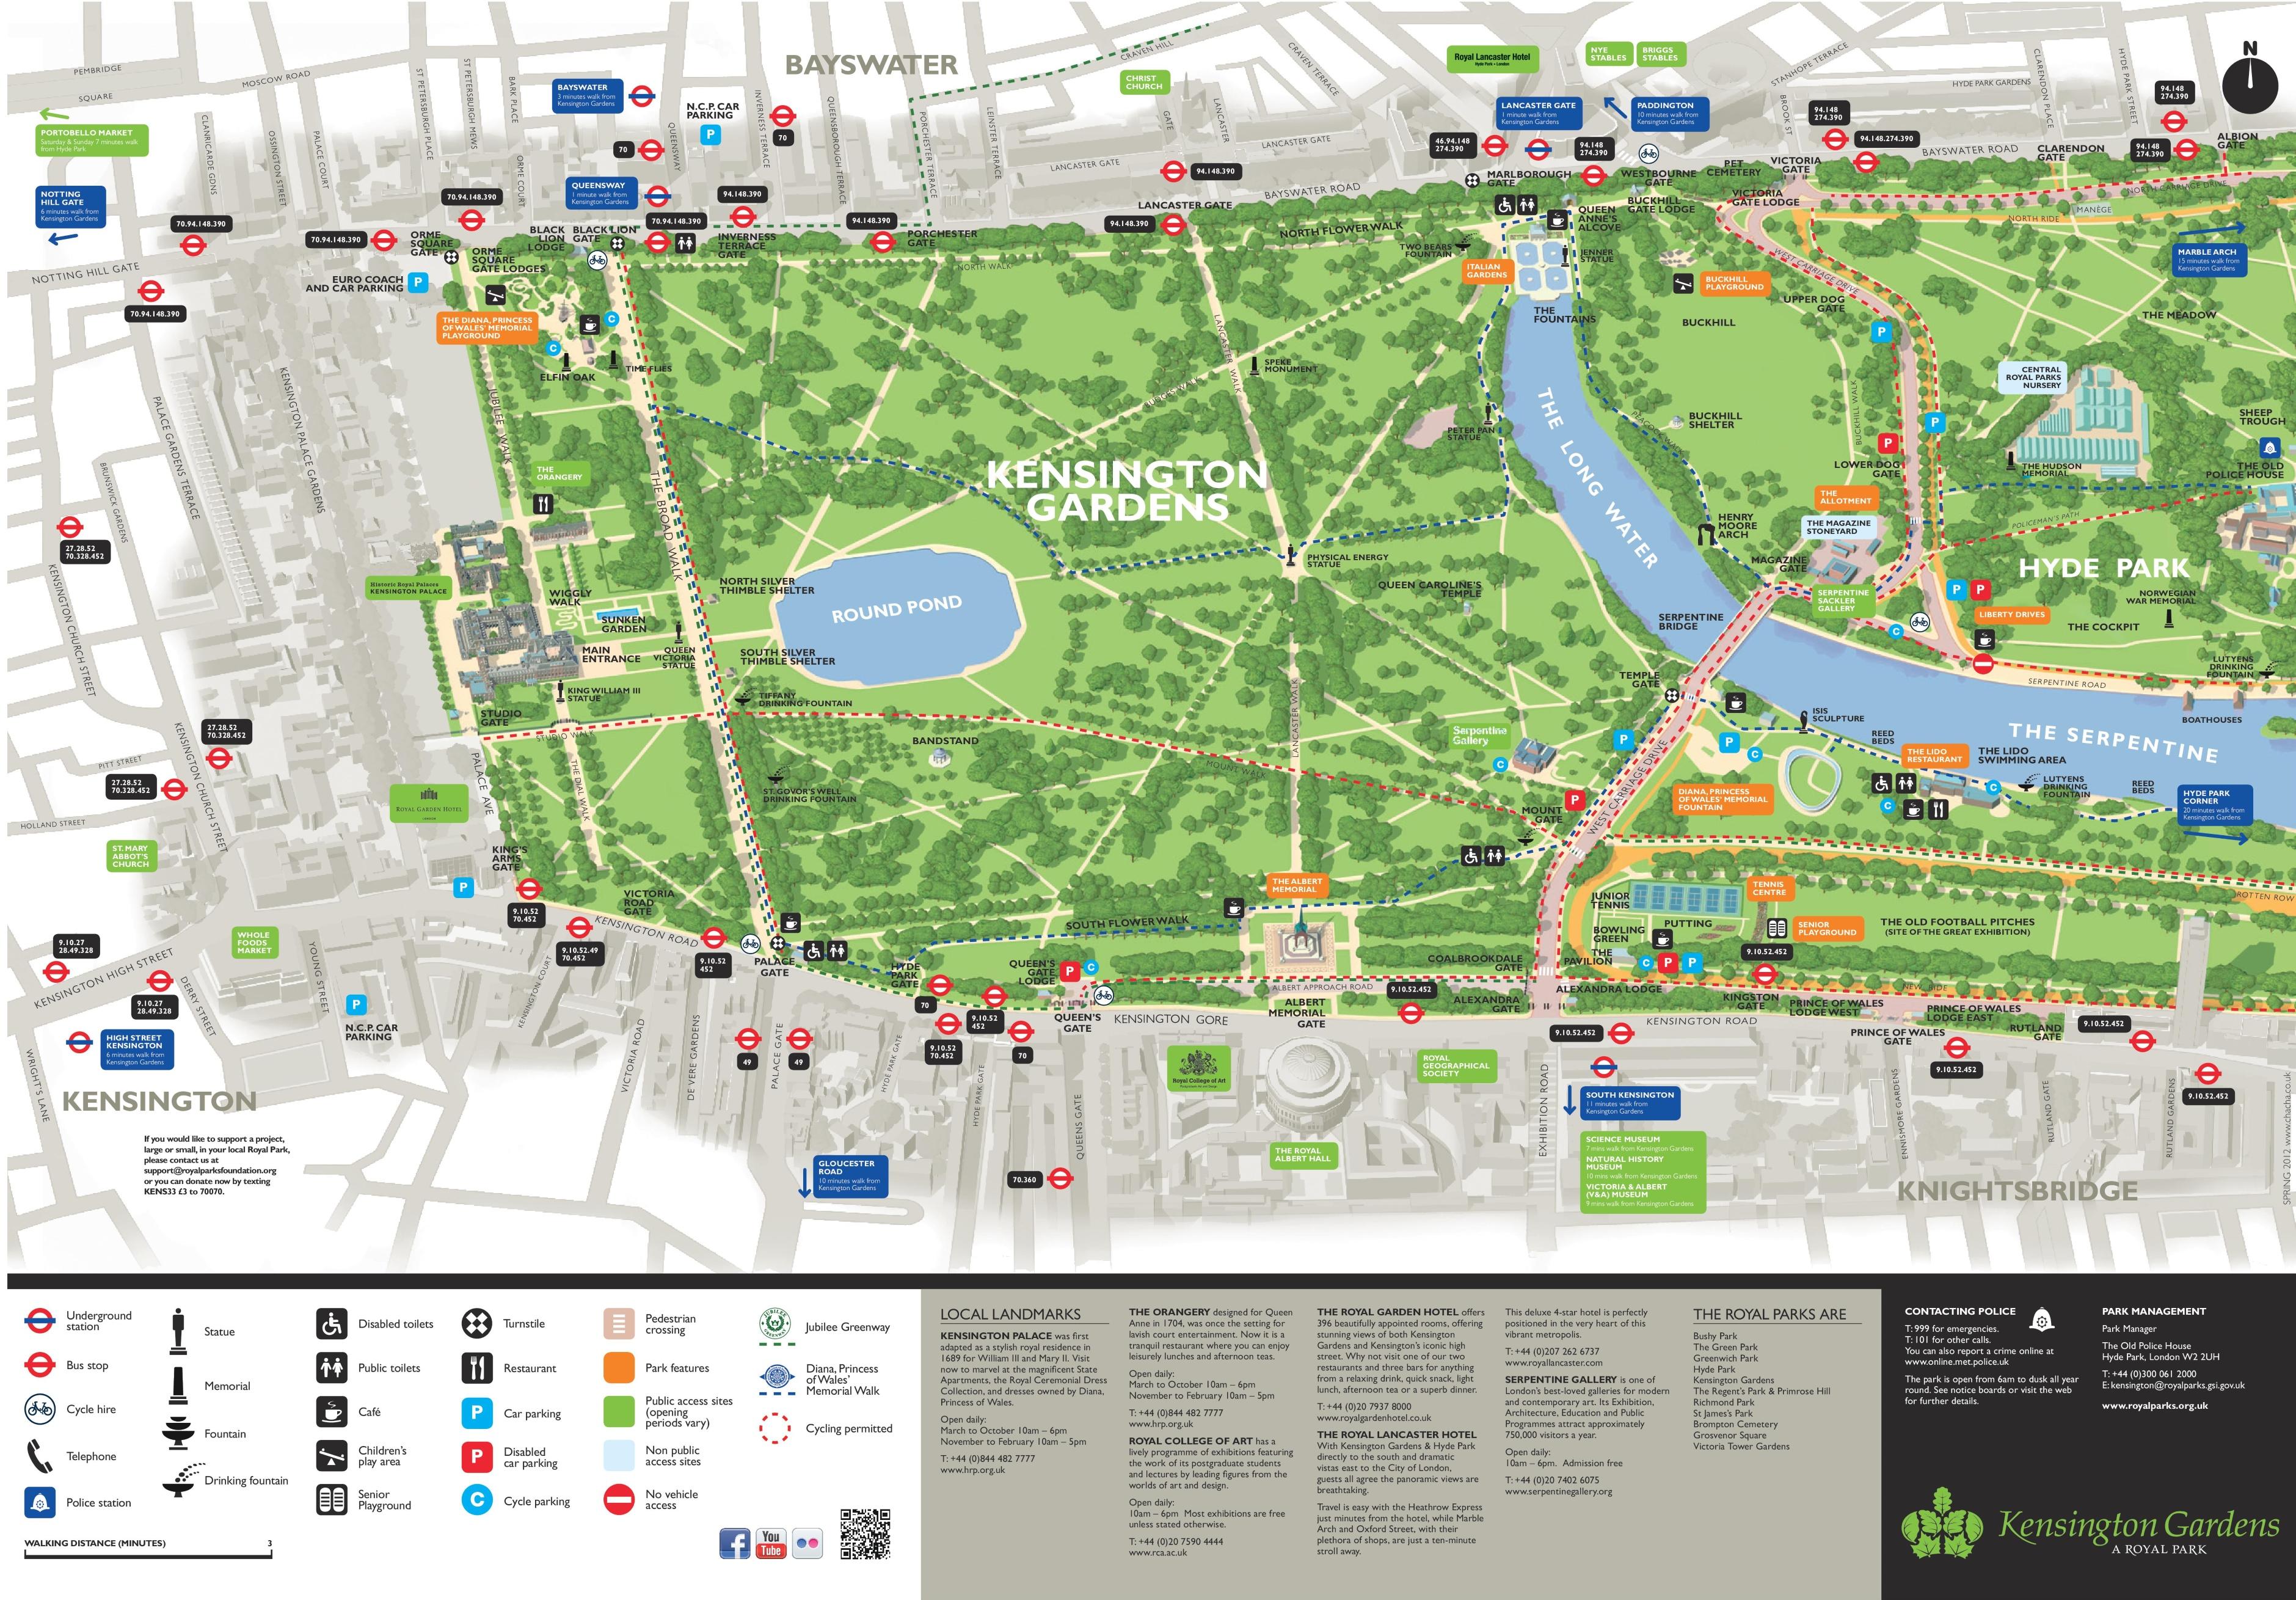 Kensington Gardens Map Kensington Gardens map